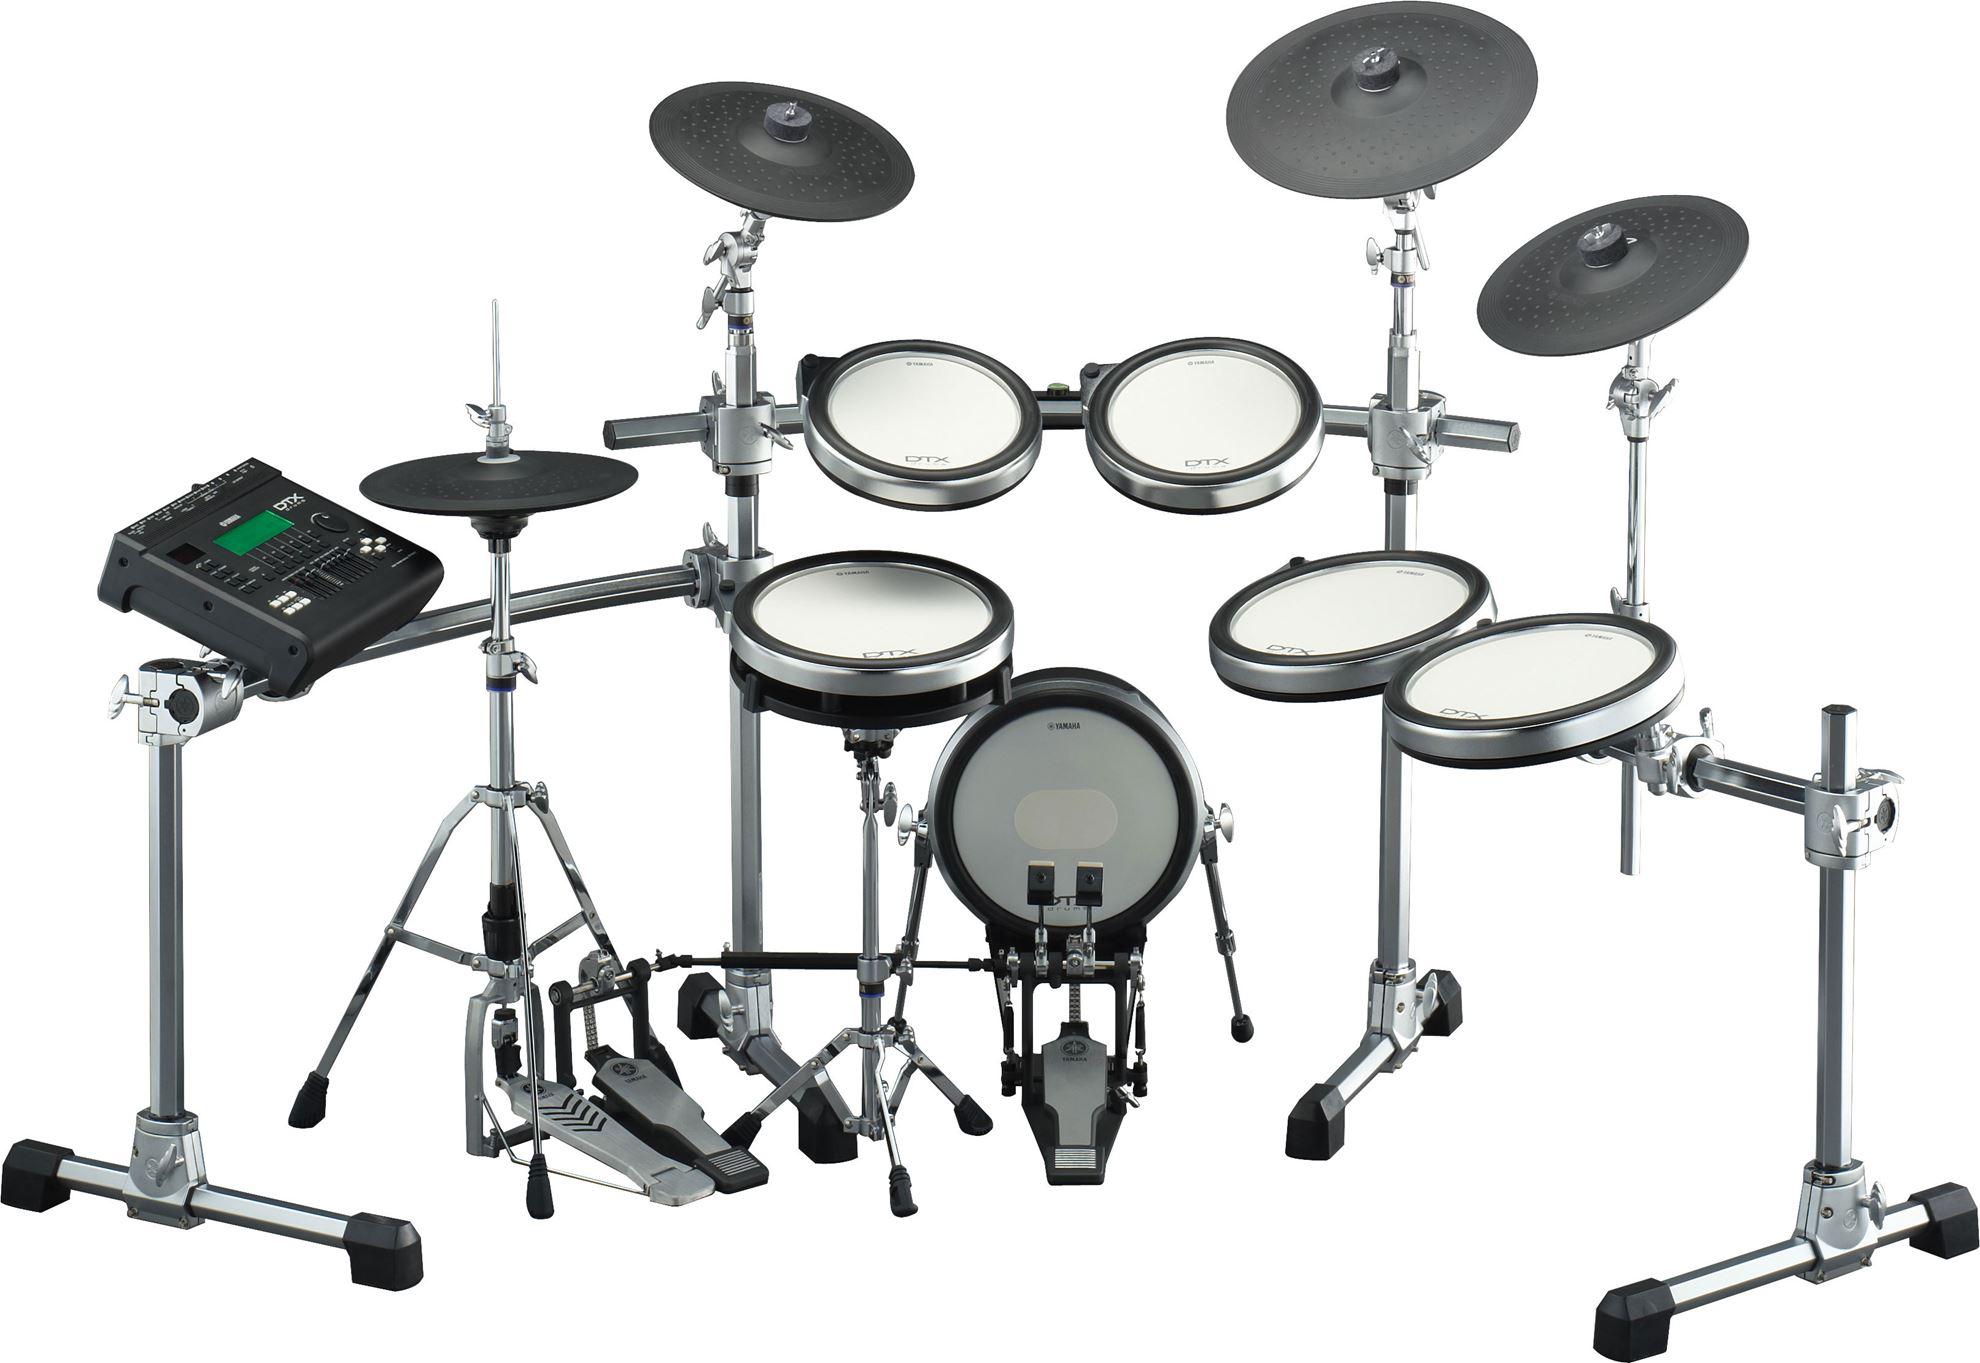 Yamaha dtx950k electronic drum kit perth mega music online for Yamaha drums electronic